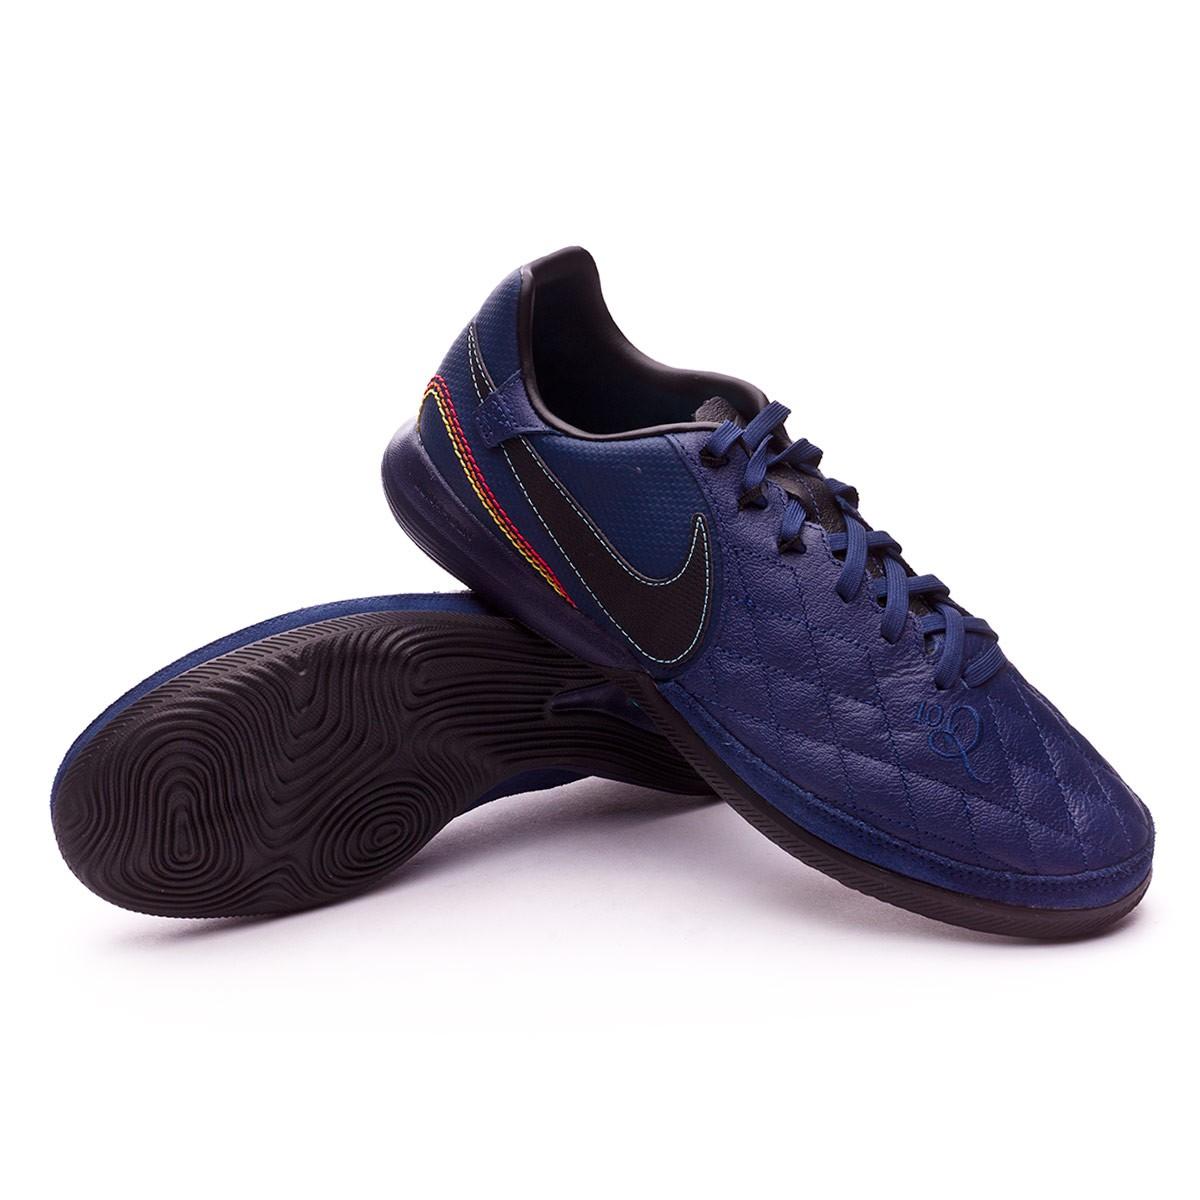 Sapatilha de Futsal Nike TiempoX Finale 10R Porto Alegre IC Midnight ... 116110b42aae5